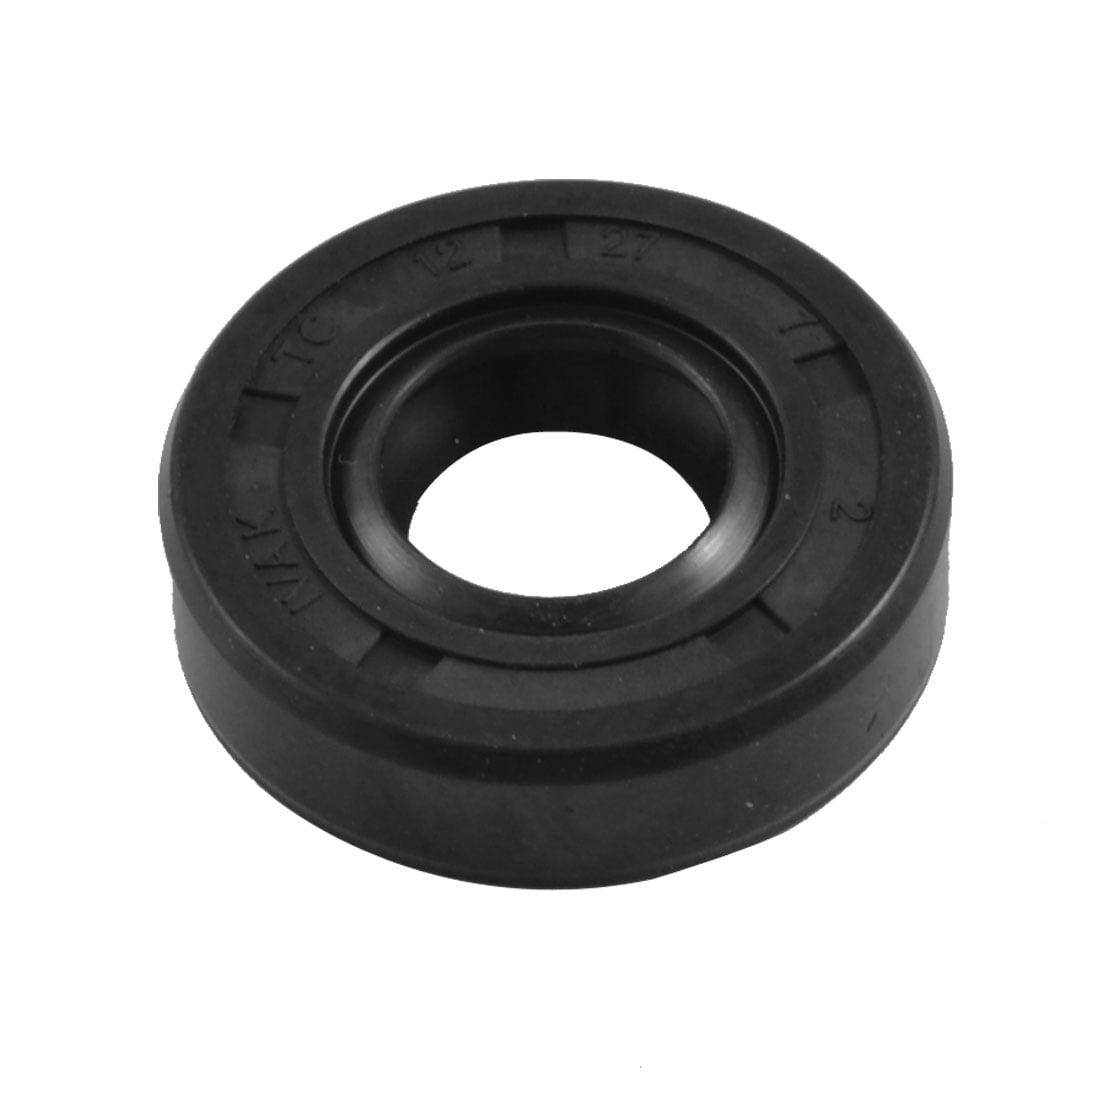 Unique Bargains 12mm x 27mm x 7mm Metric NBR Double Lipped Oil Shaft Seal TC